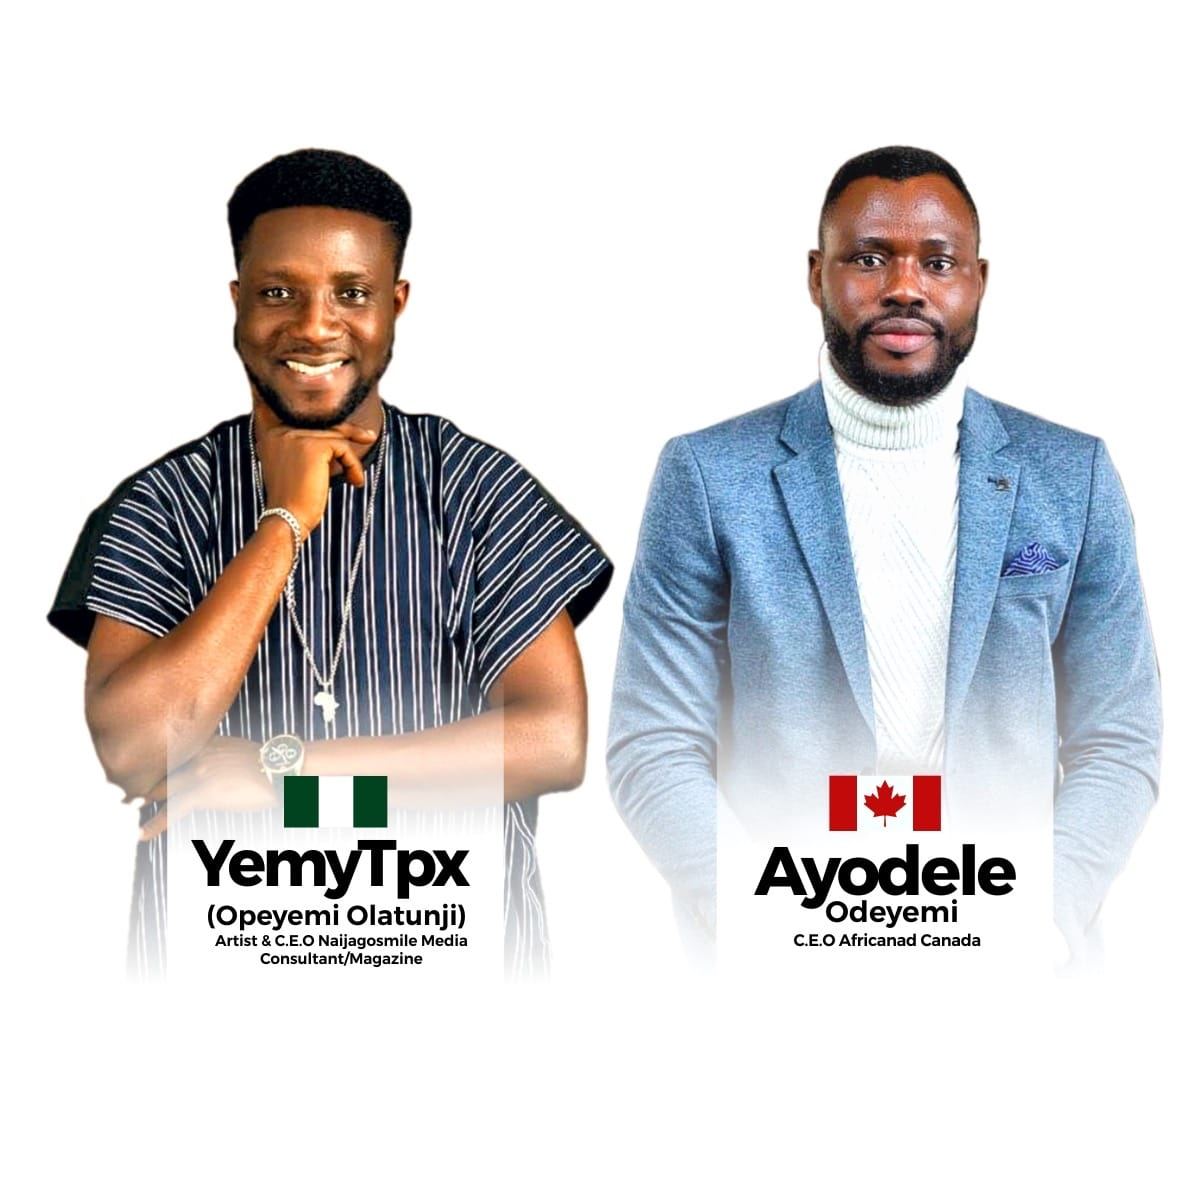 YemyTpx & Odeyemi - O Canada